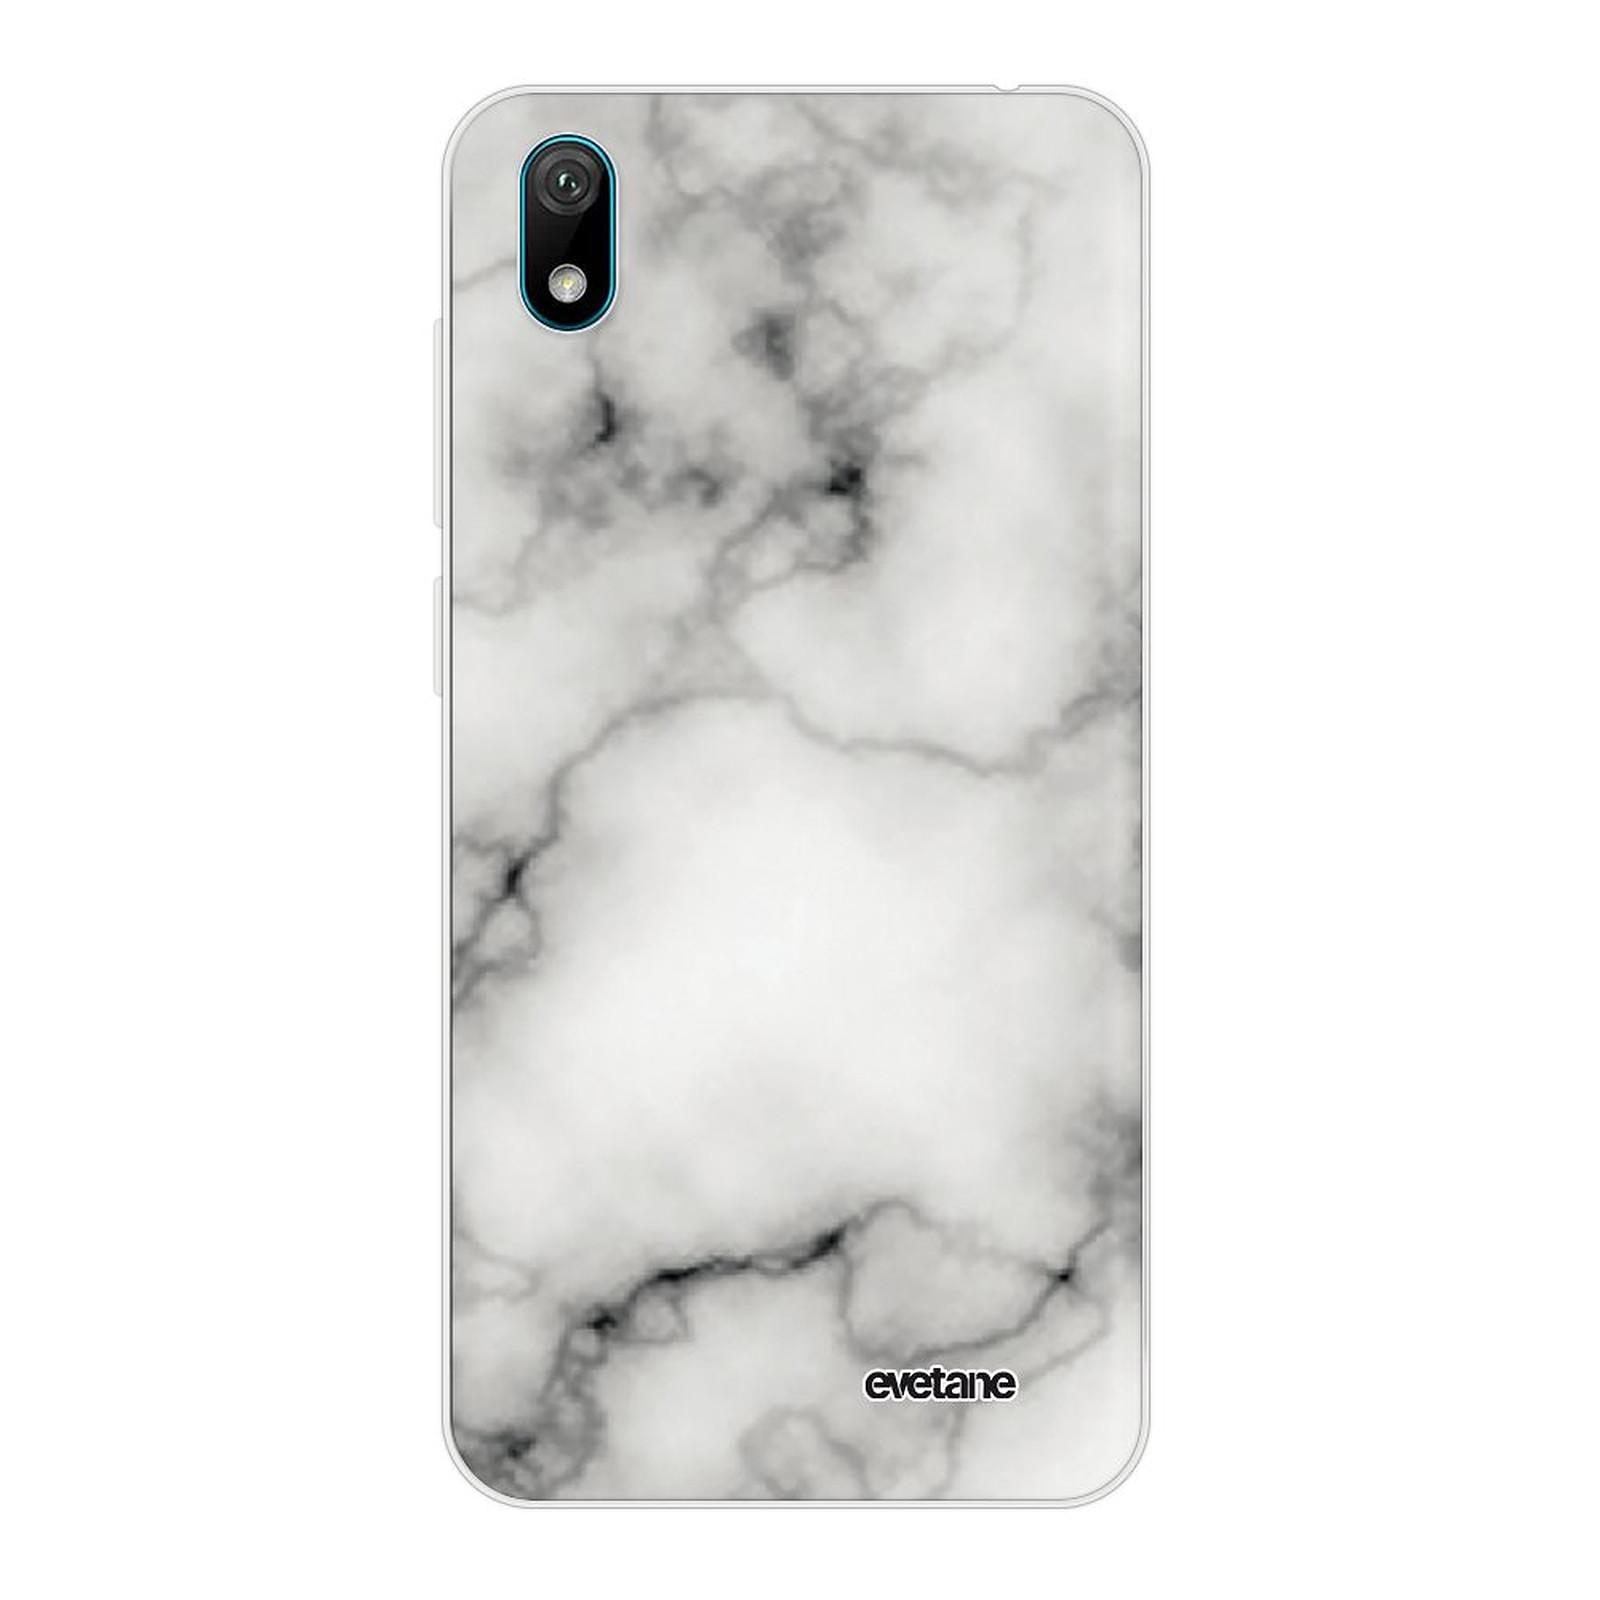 EVETANE Coque Huawei Y5 2019 360 intégrale transparente Marbre blanc Tendance - Coque téléphone Evetane sur LDLC